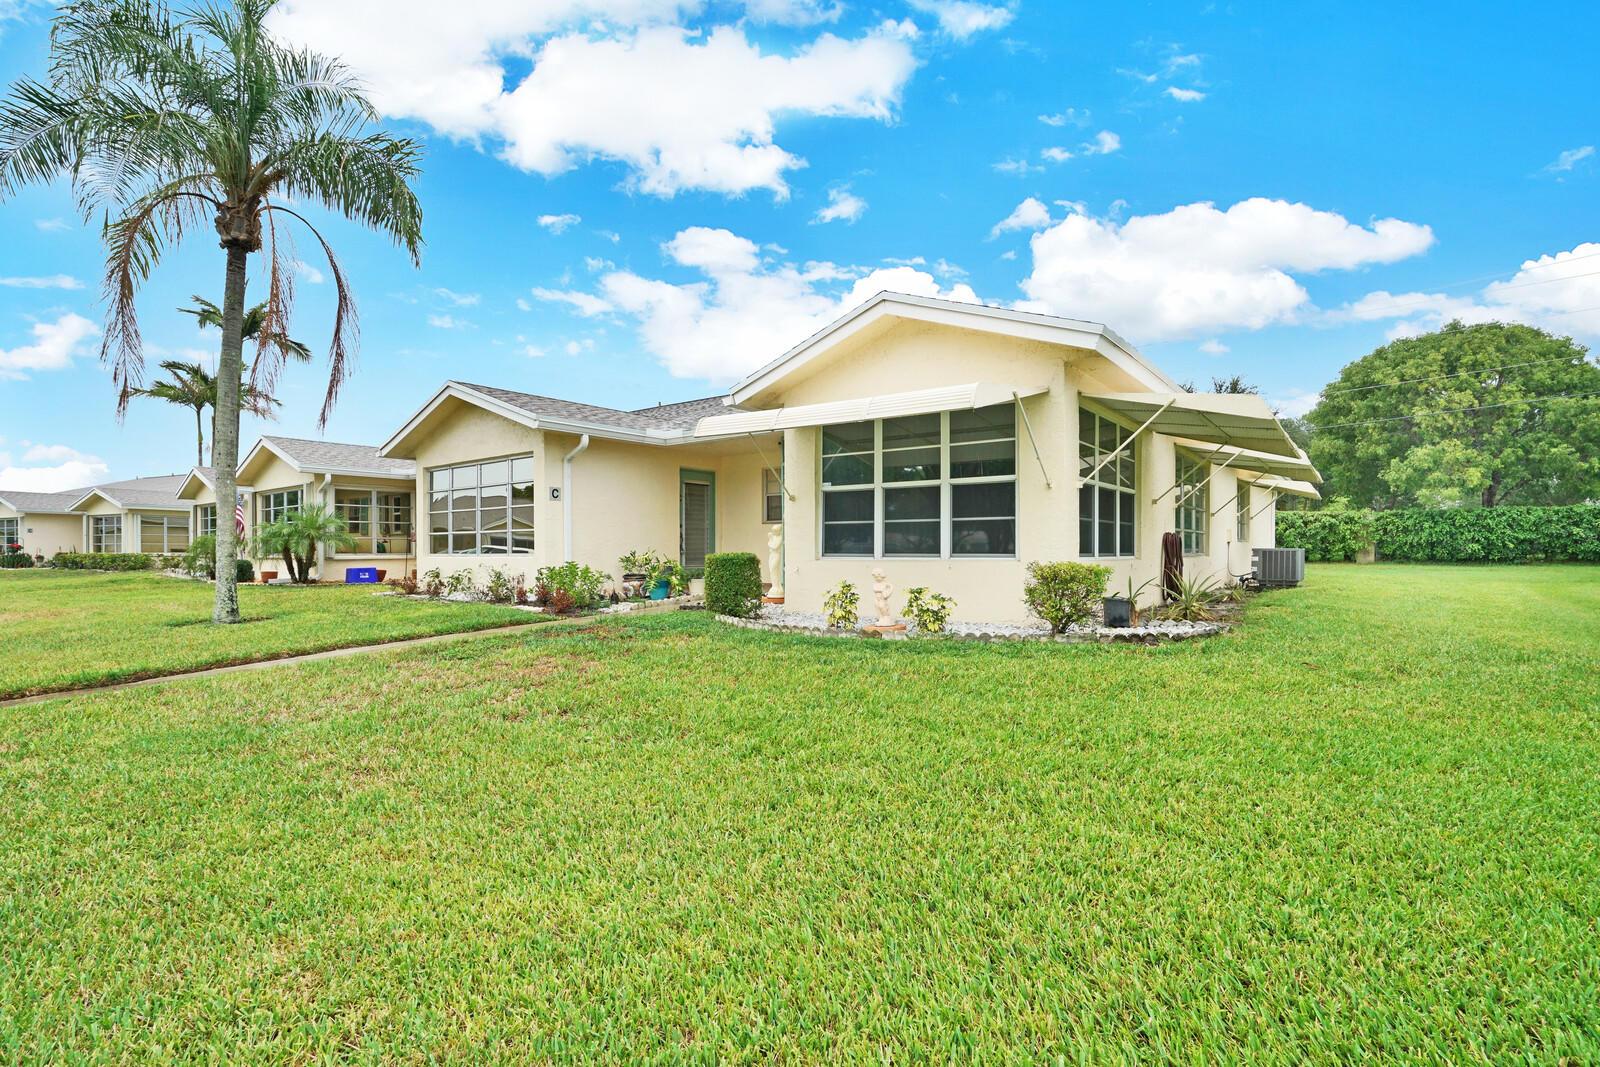 5138  Lakefront Boulevard D For Sale 10726159, FL